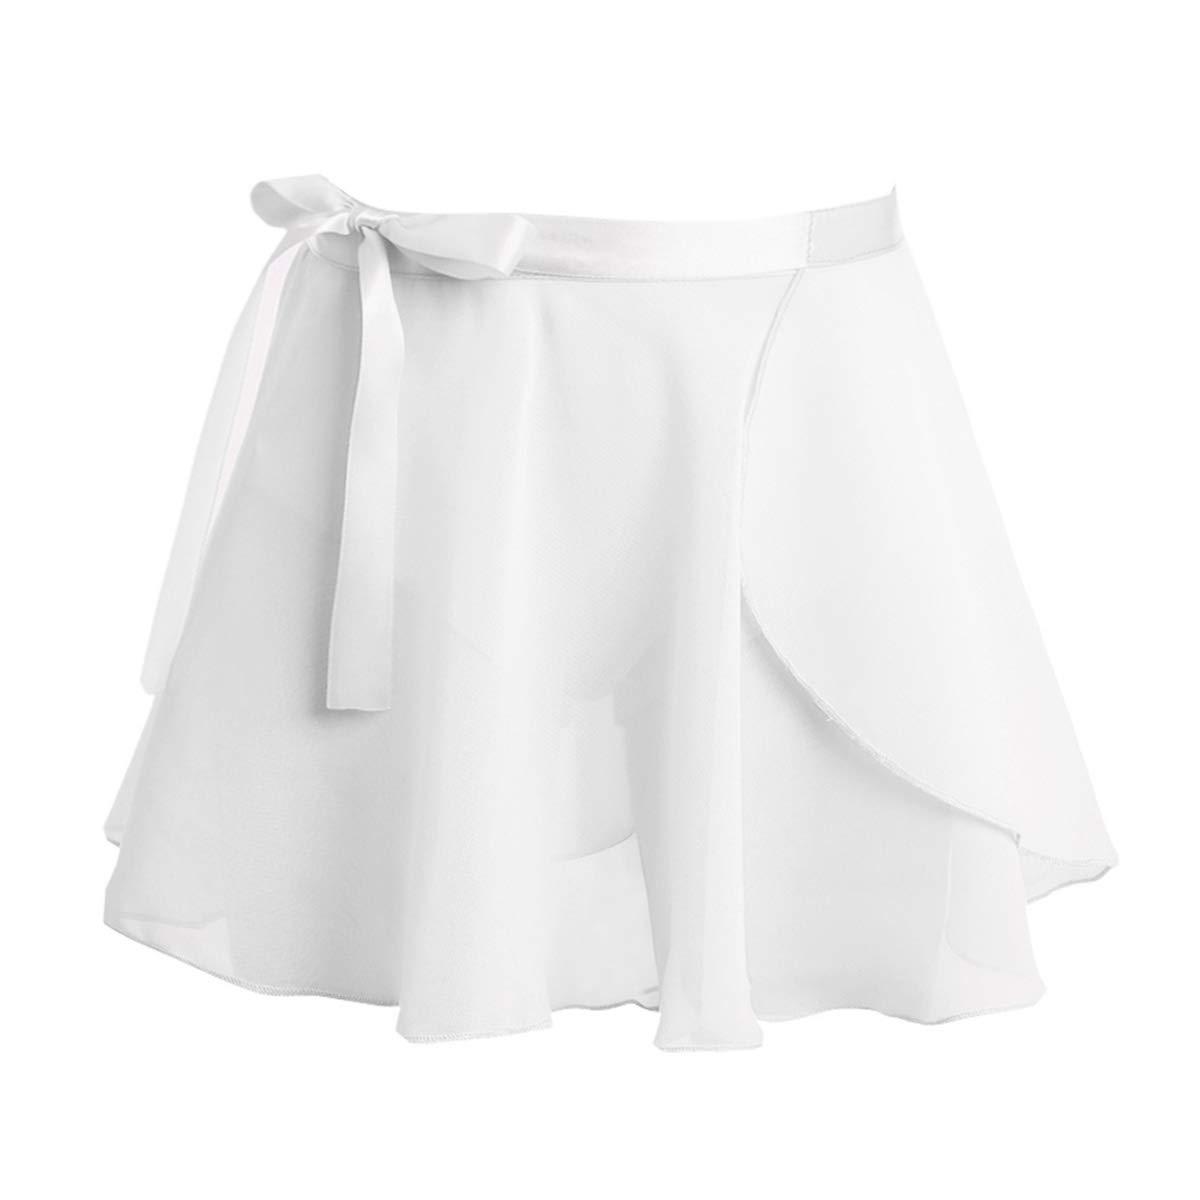 Agoky Kids Girls Classic Dance Basic Chiffon/Floral Lace Pleated Short Tutu Skirt Pull On Warp Dance Wear White Chiffon 4-6